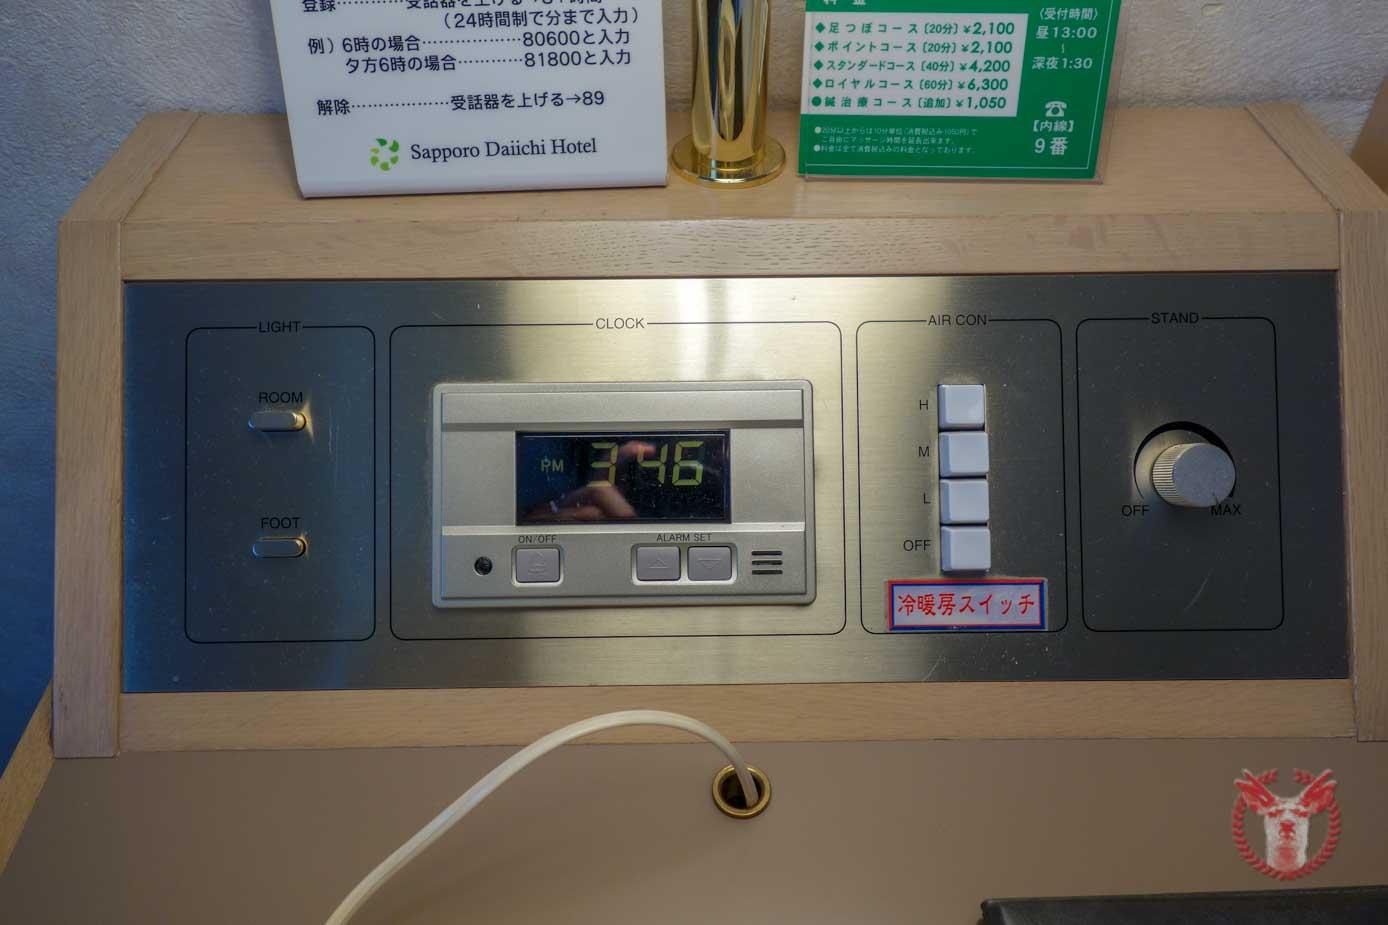 sapporo-daiichihotel-9